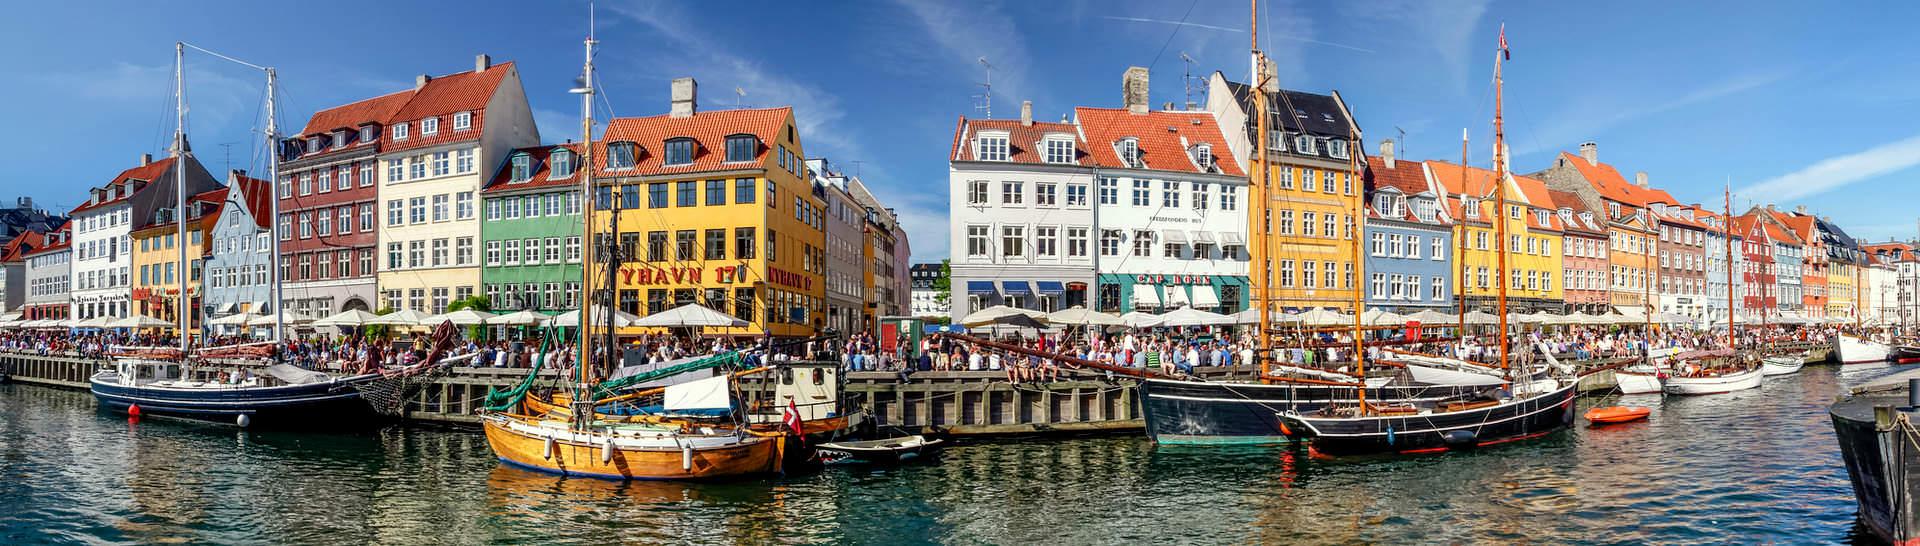 Nyhavn harbor is the most famous attraction in the capital of Denmark - Copenhagen